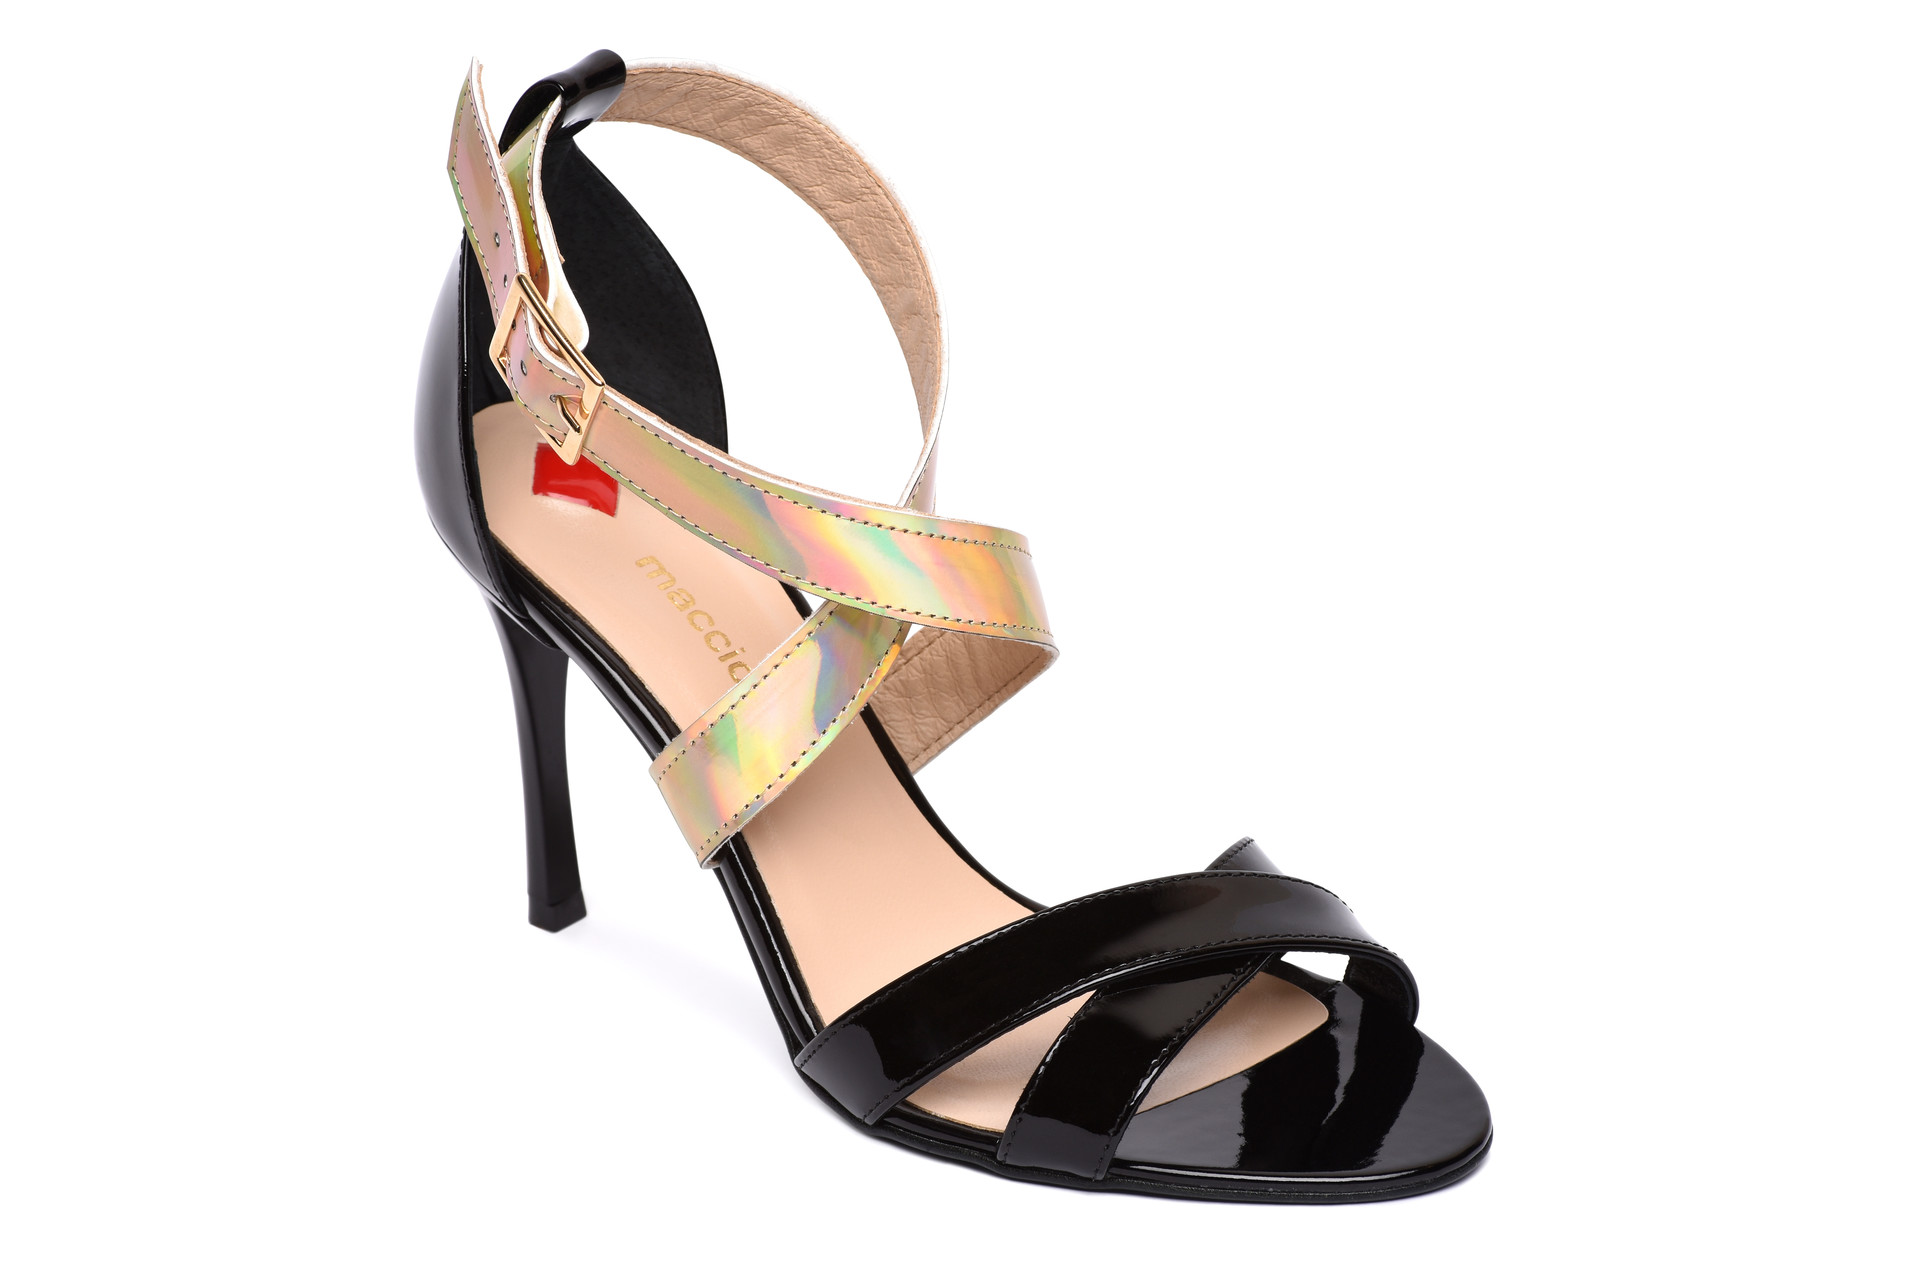 00b3222c38a9 GALLERY SHOES - Sandále - Sandále čierno-zlatá lakové maccioni